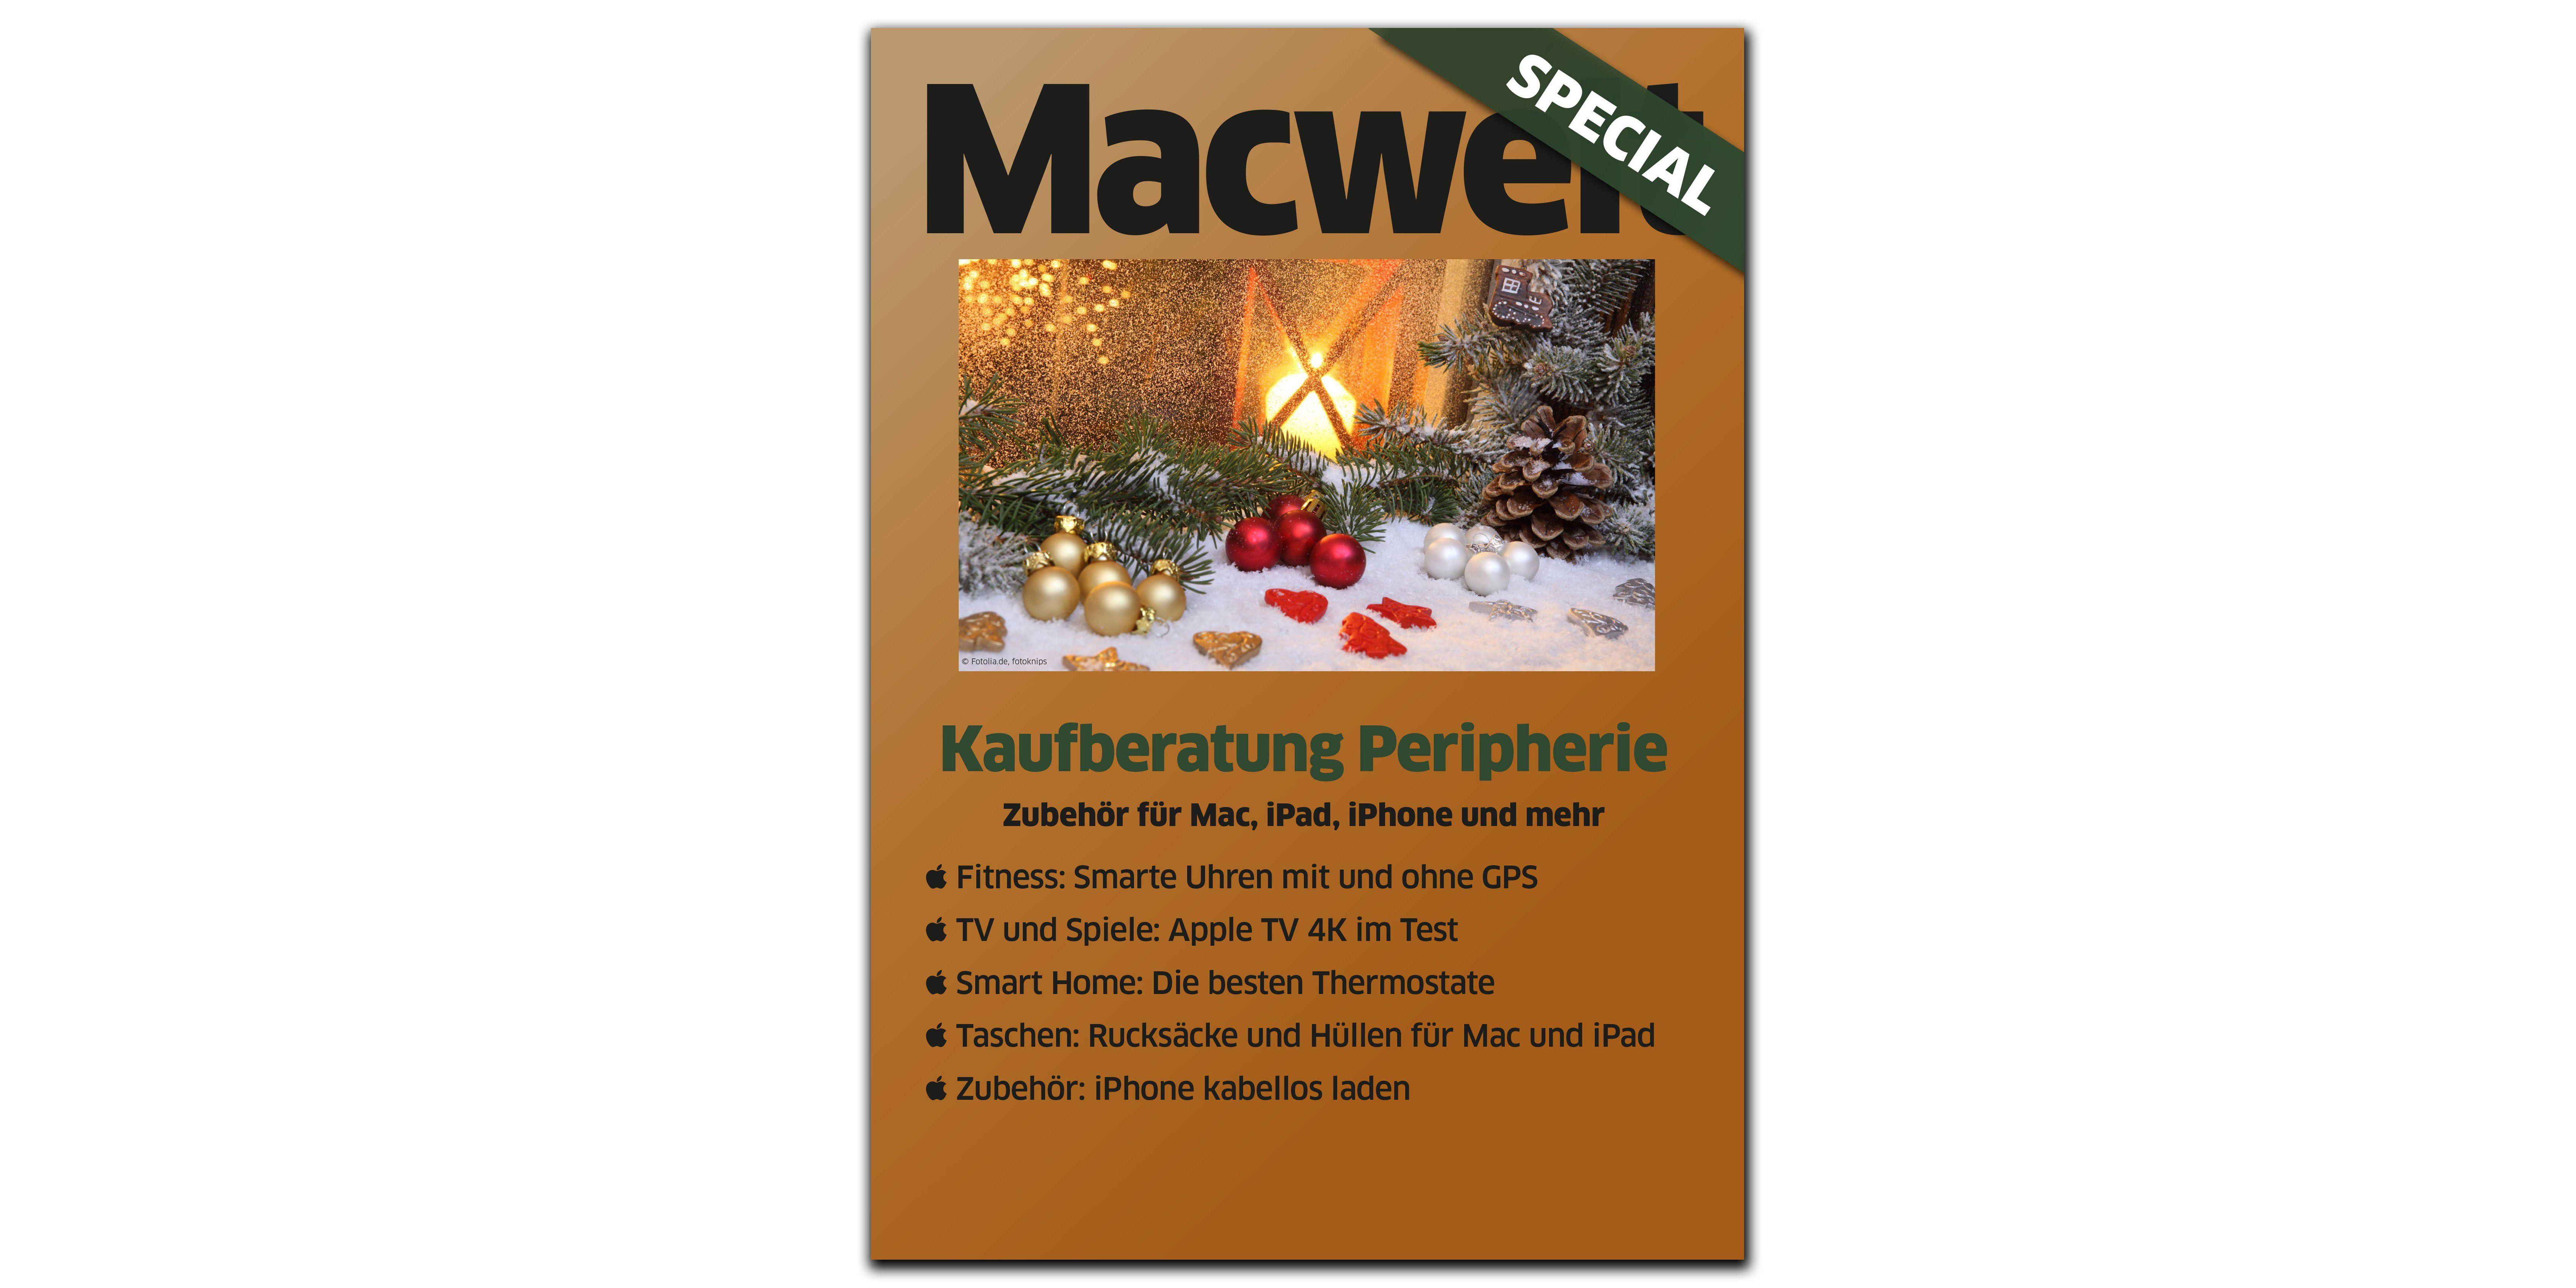 Neues Special: Kaufberatung Peripherie - Macwelt